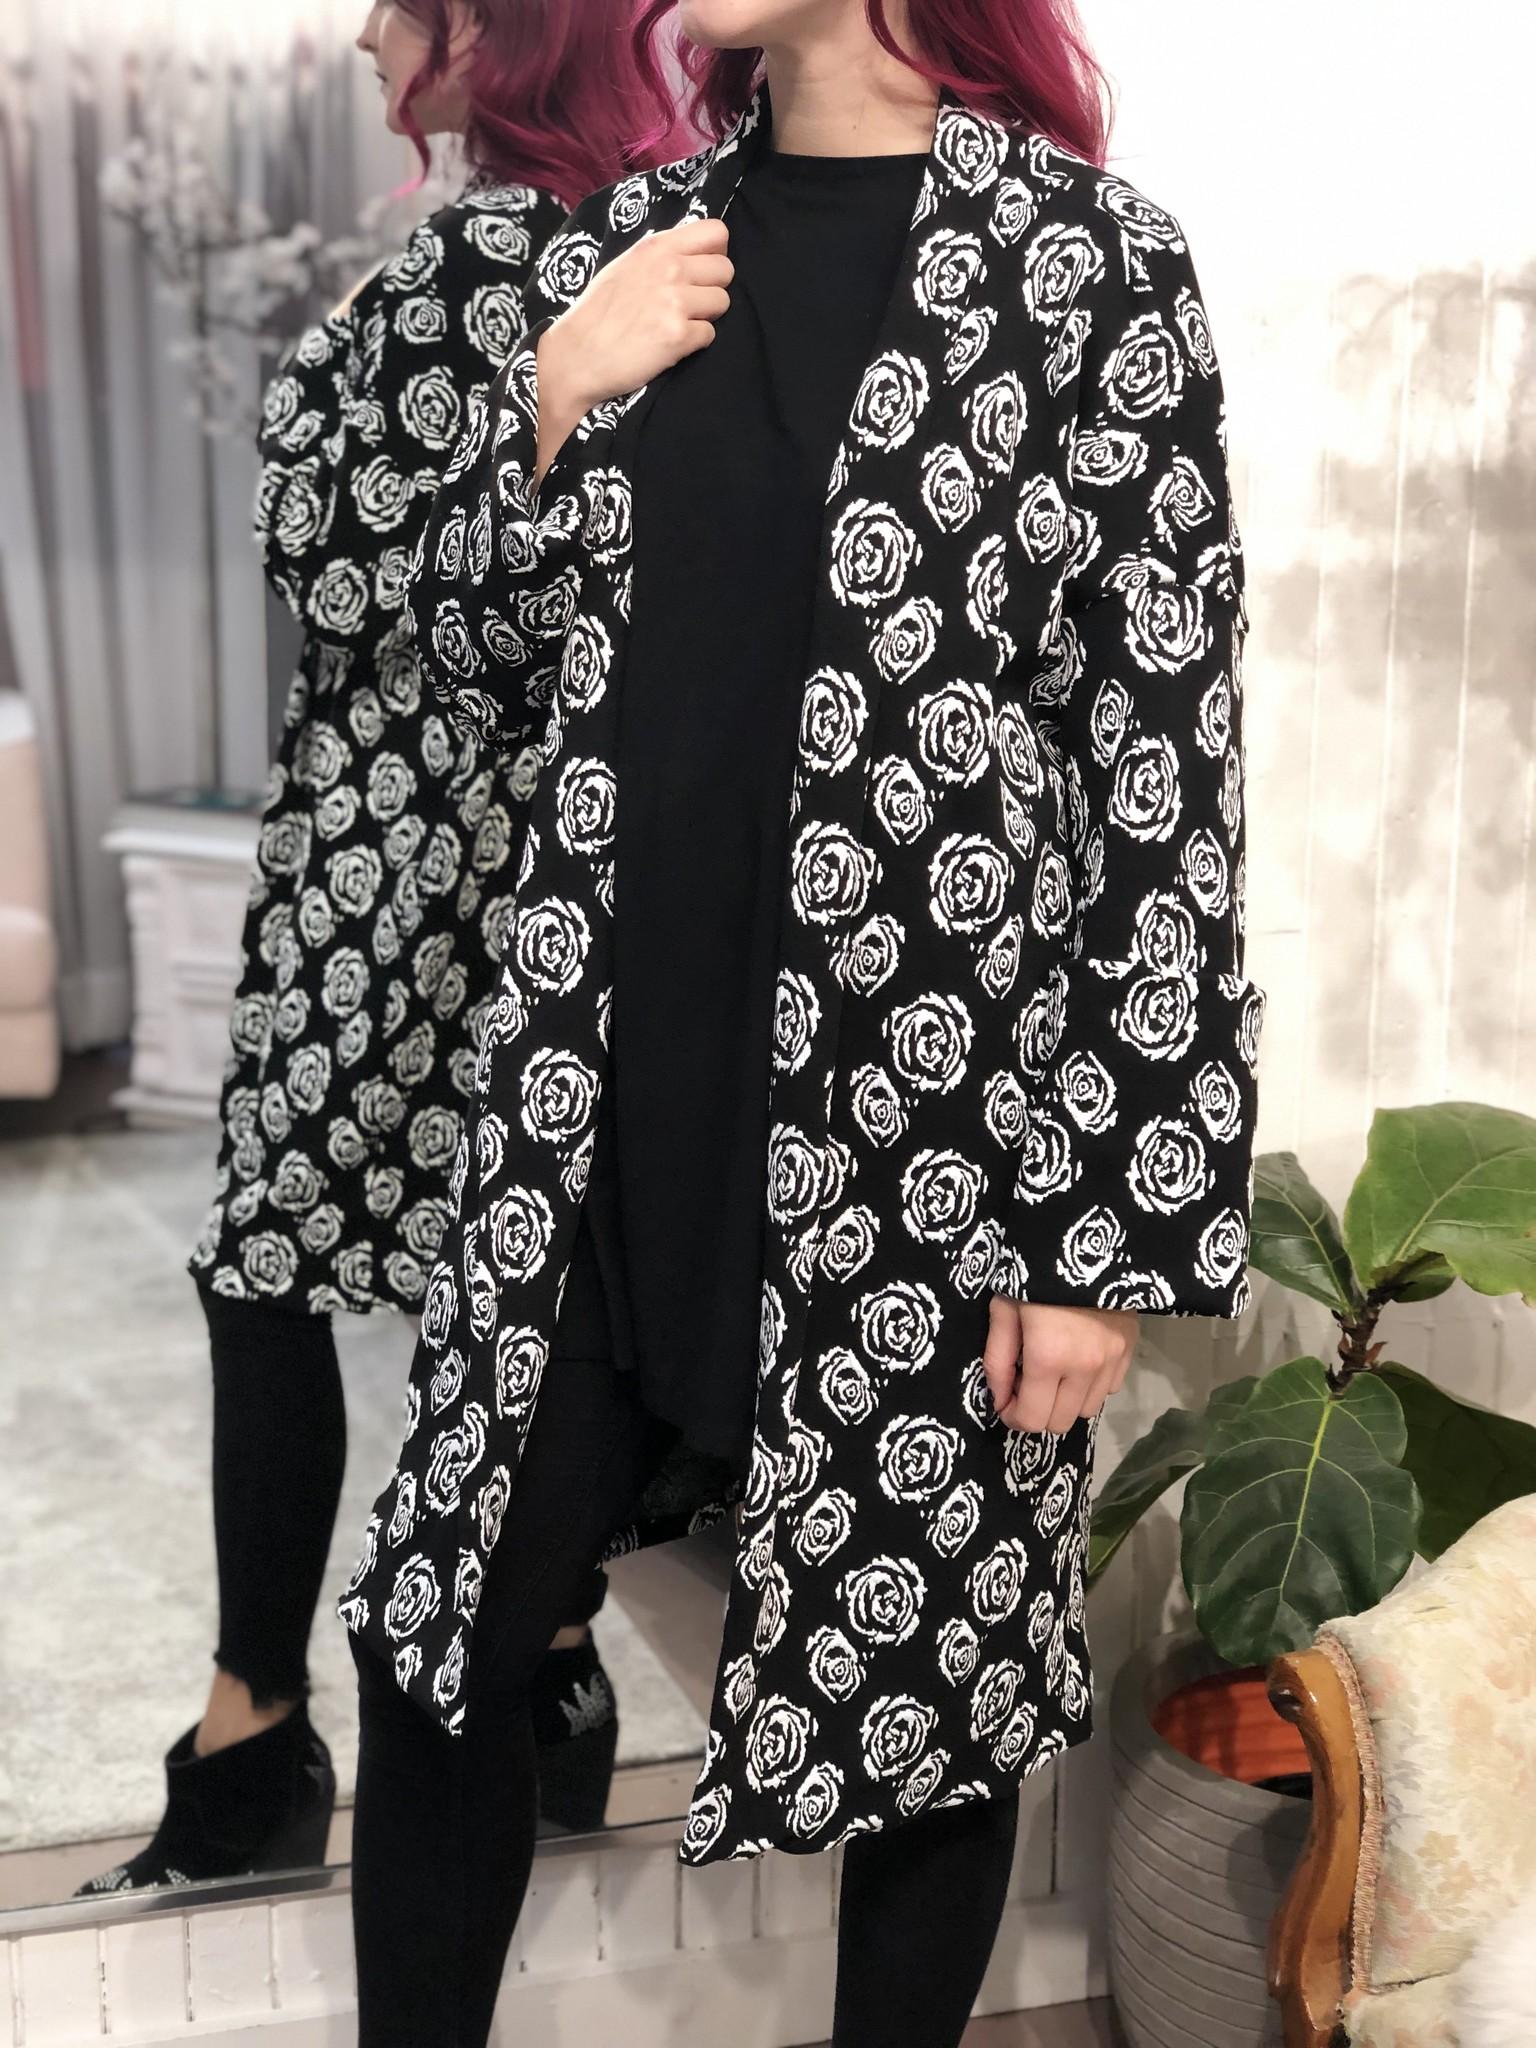 Sooley Designs Cooper Sweater - B&W Rose